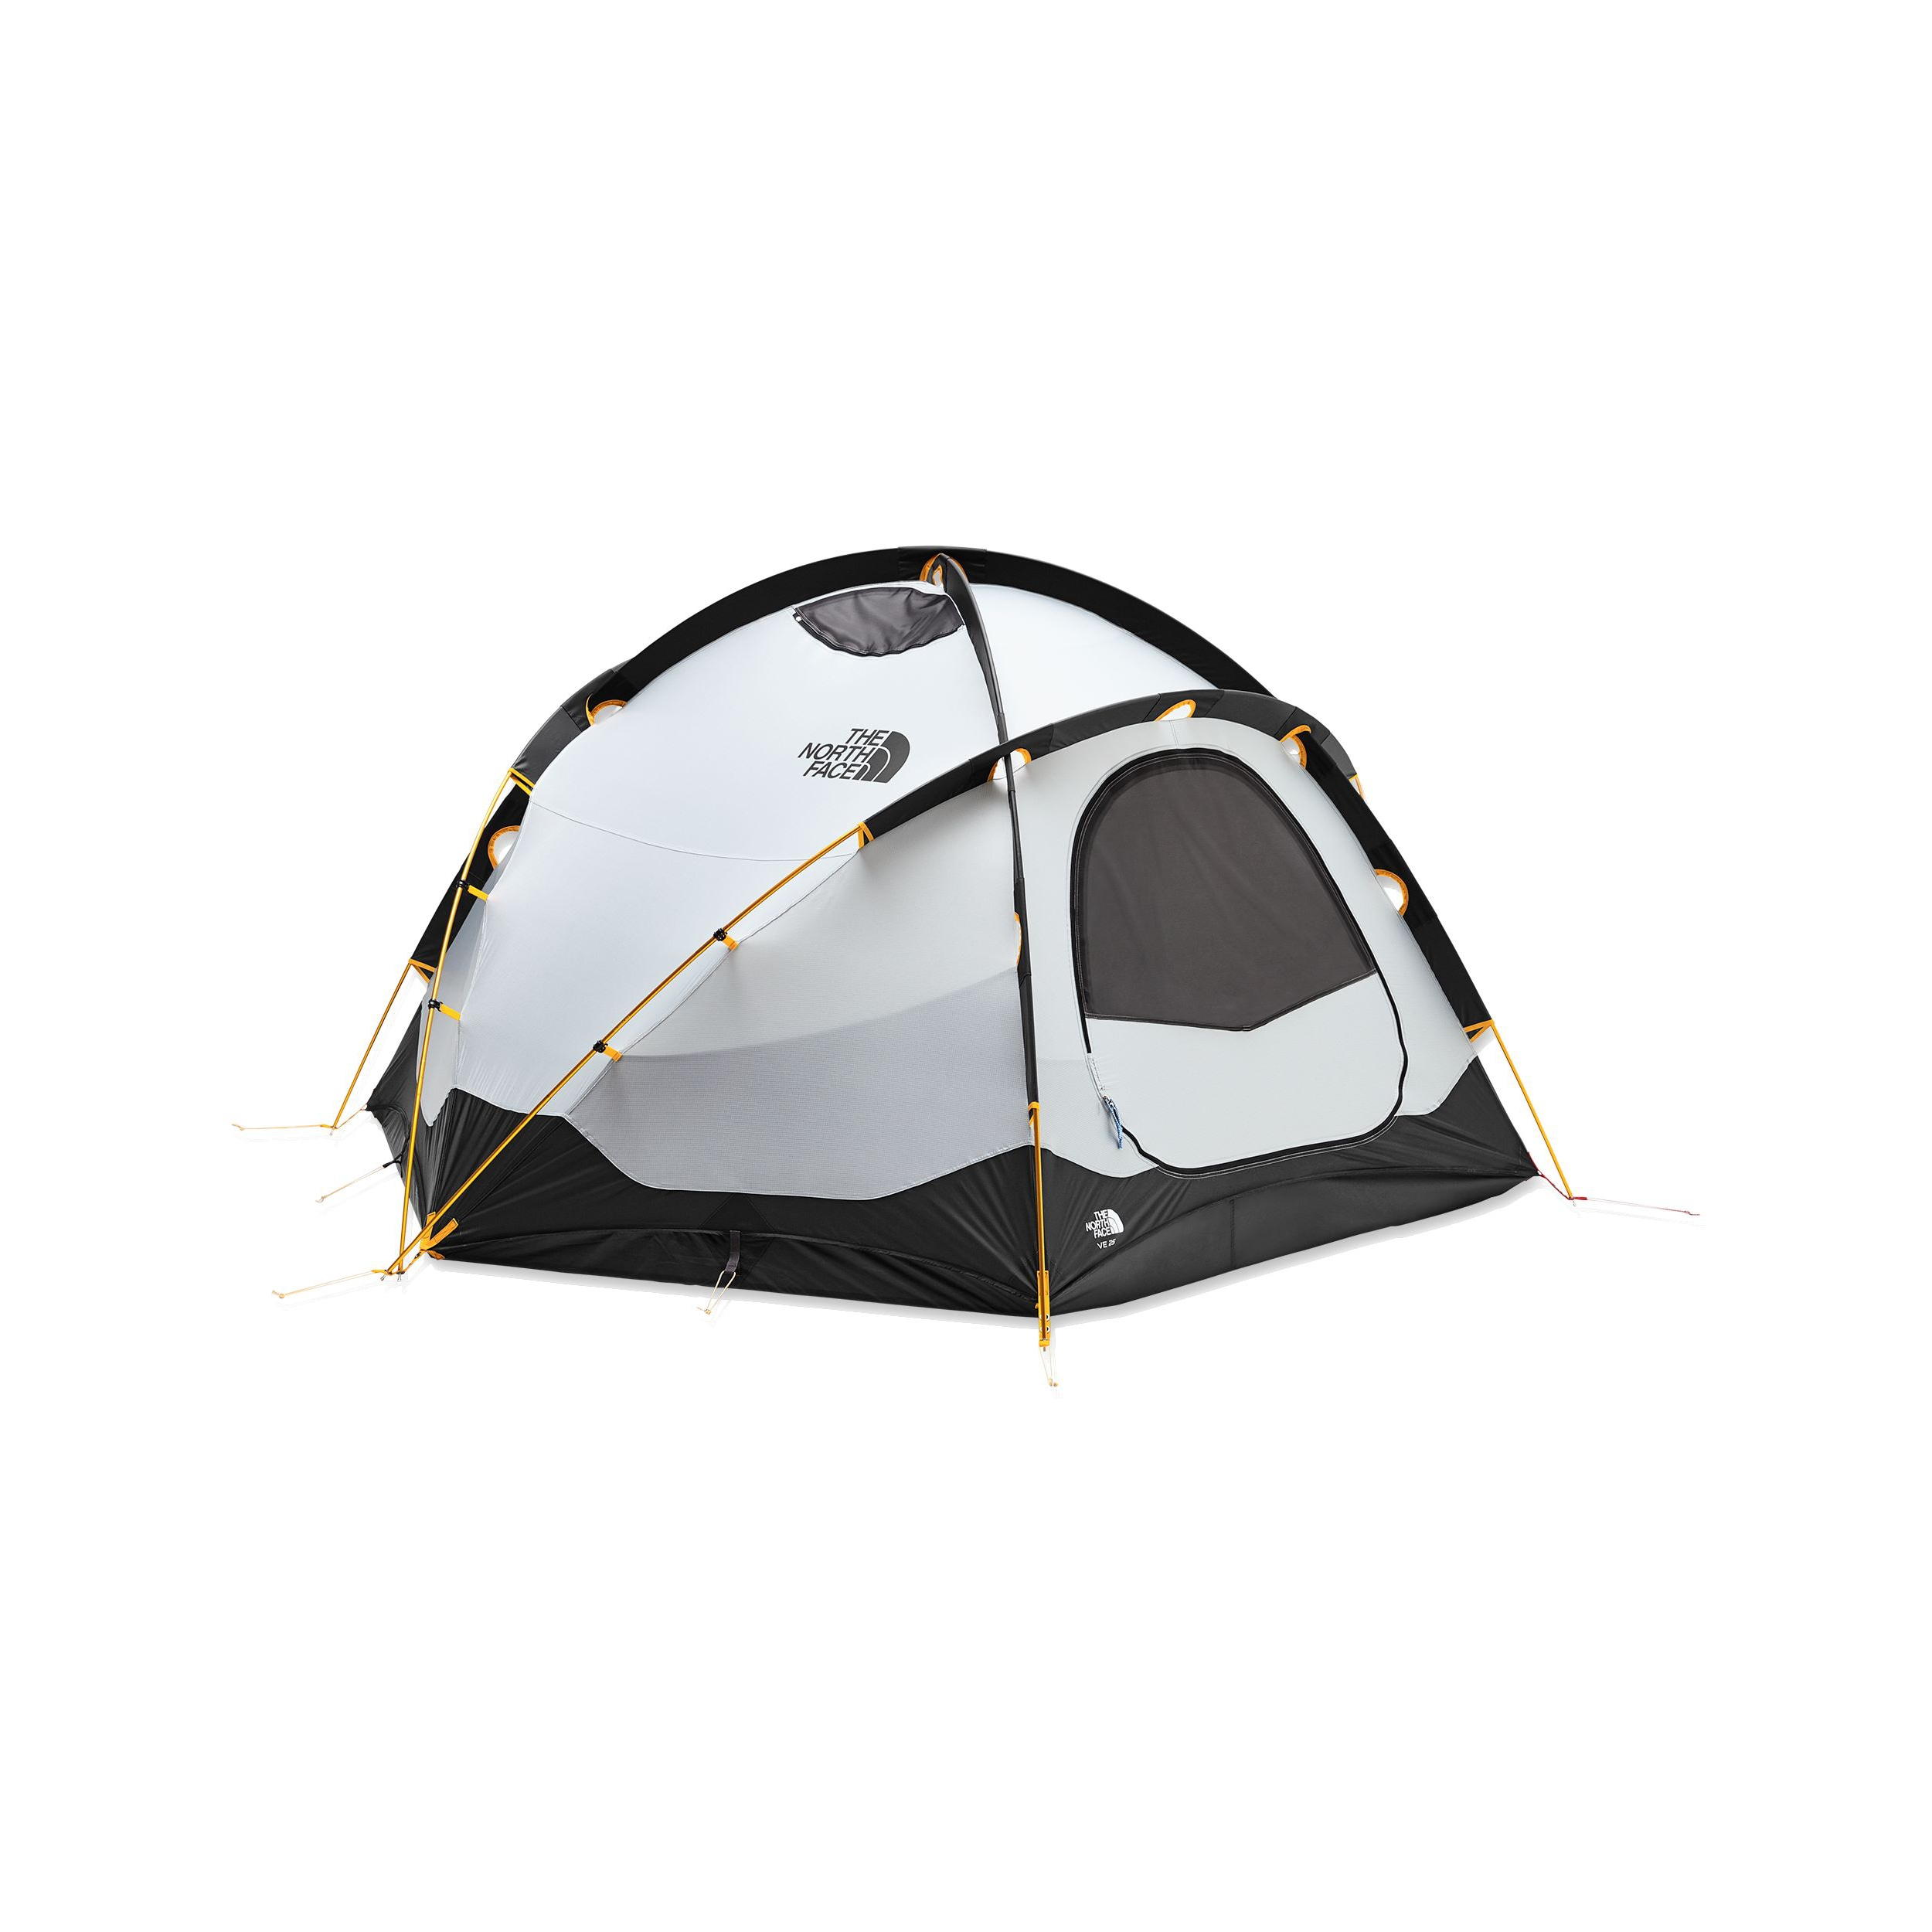 VE 25 Tent